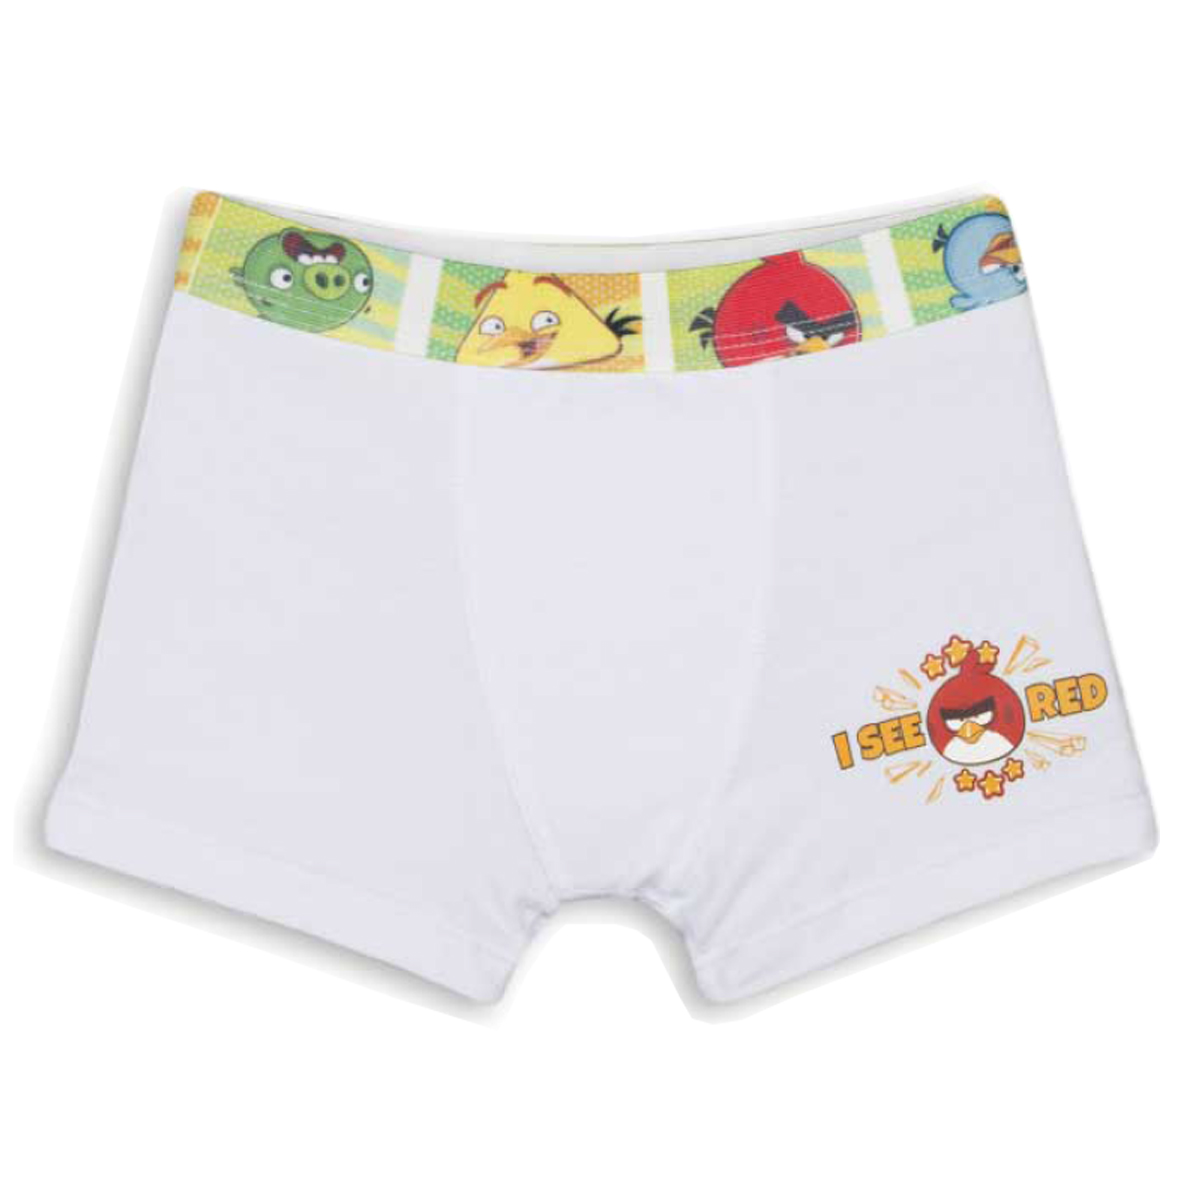 Cueca Boxer Angry Birds Branca | LUPO